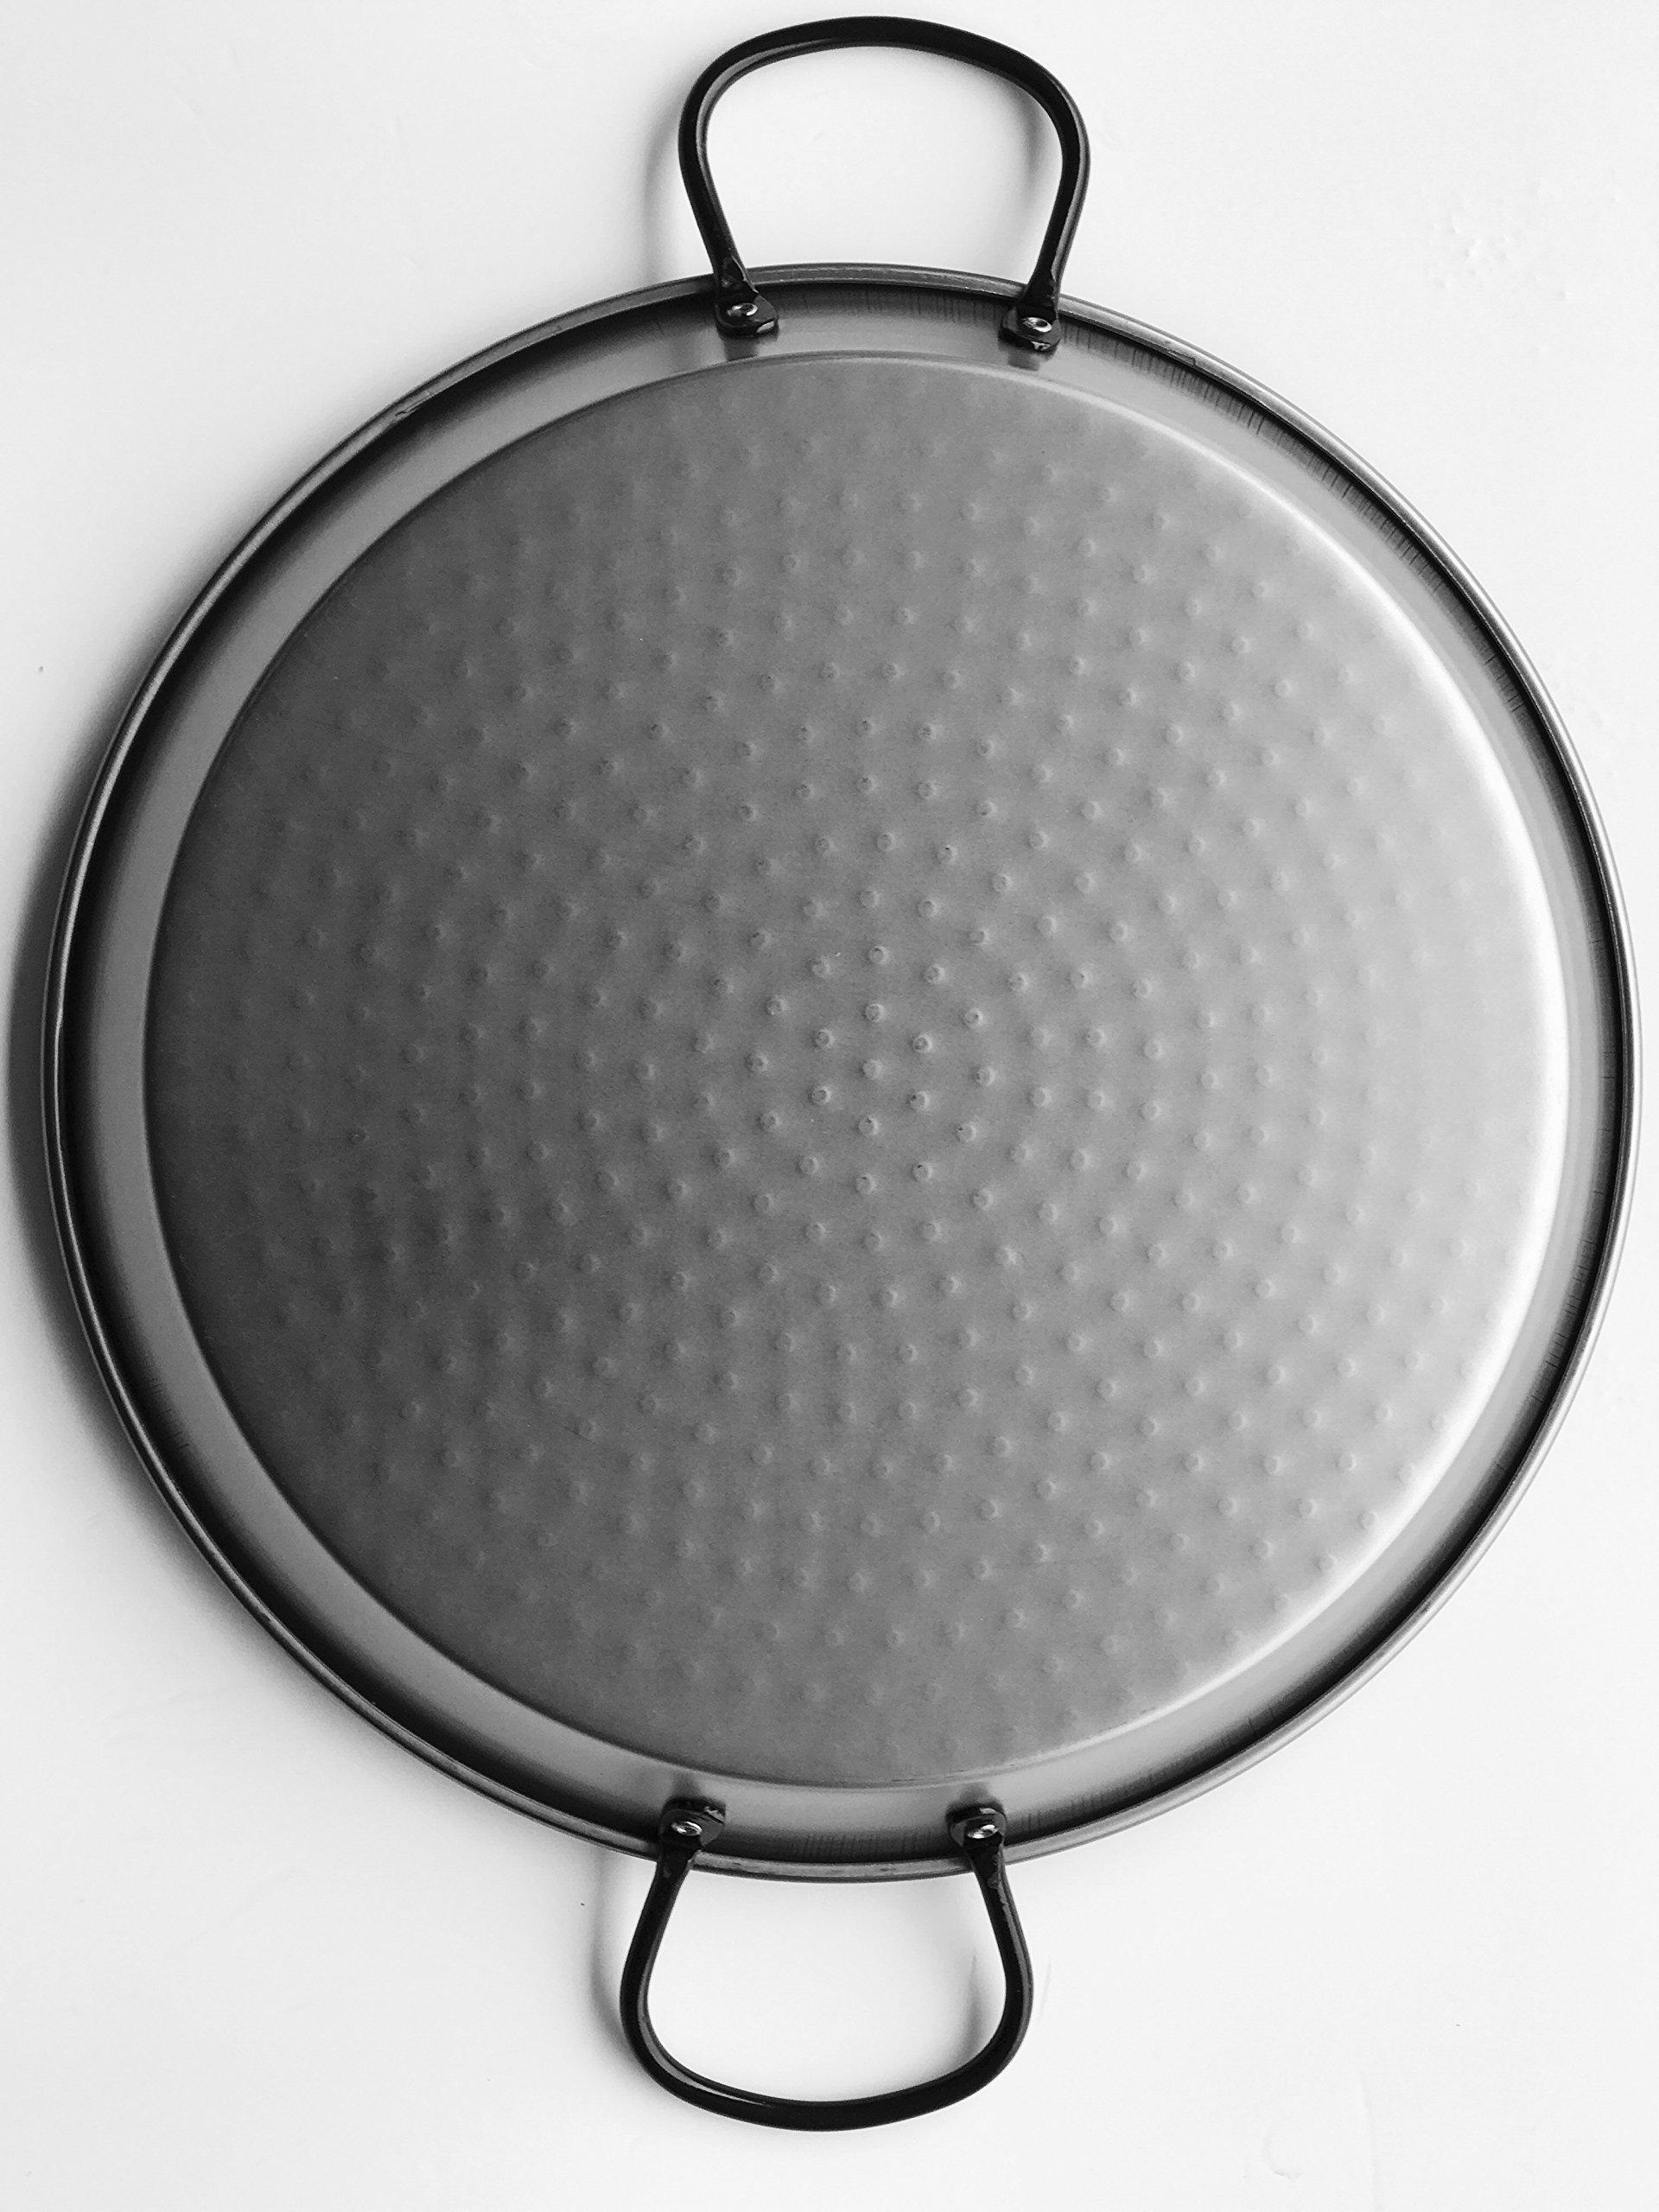 Polished Steel Valencian paella pan 26Inch / 65cm / 25 Servings